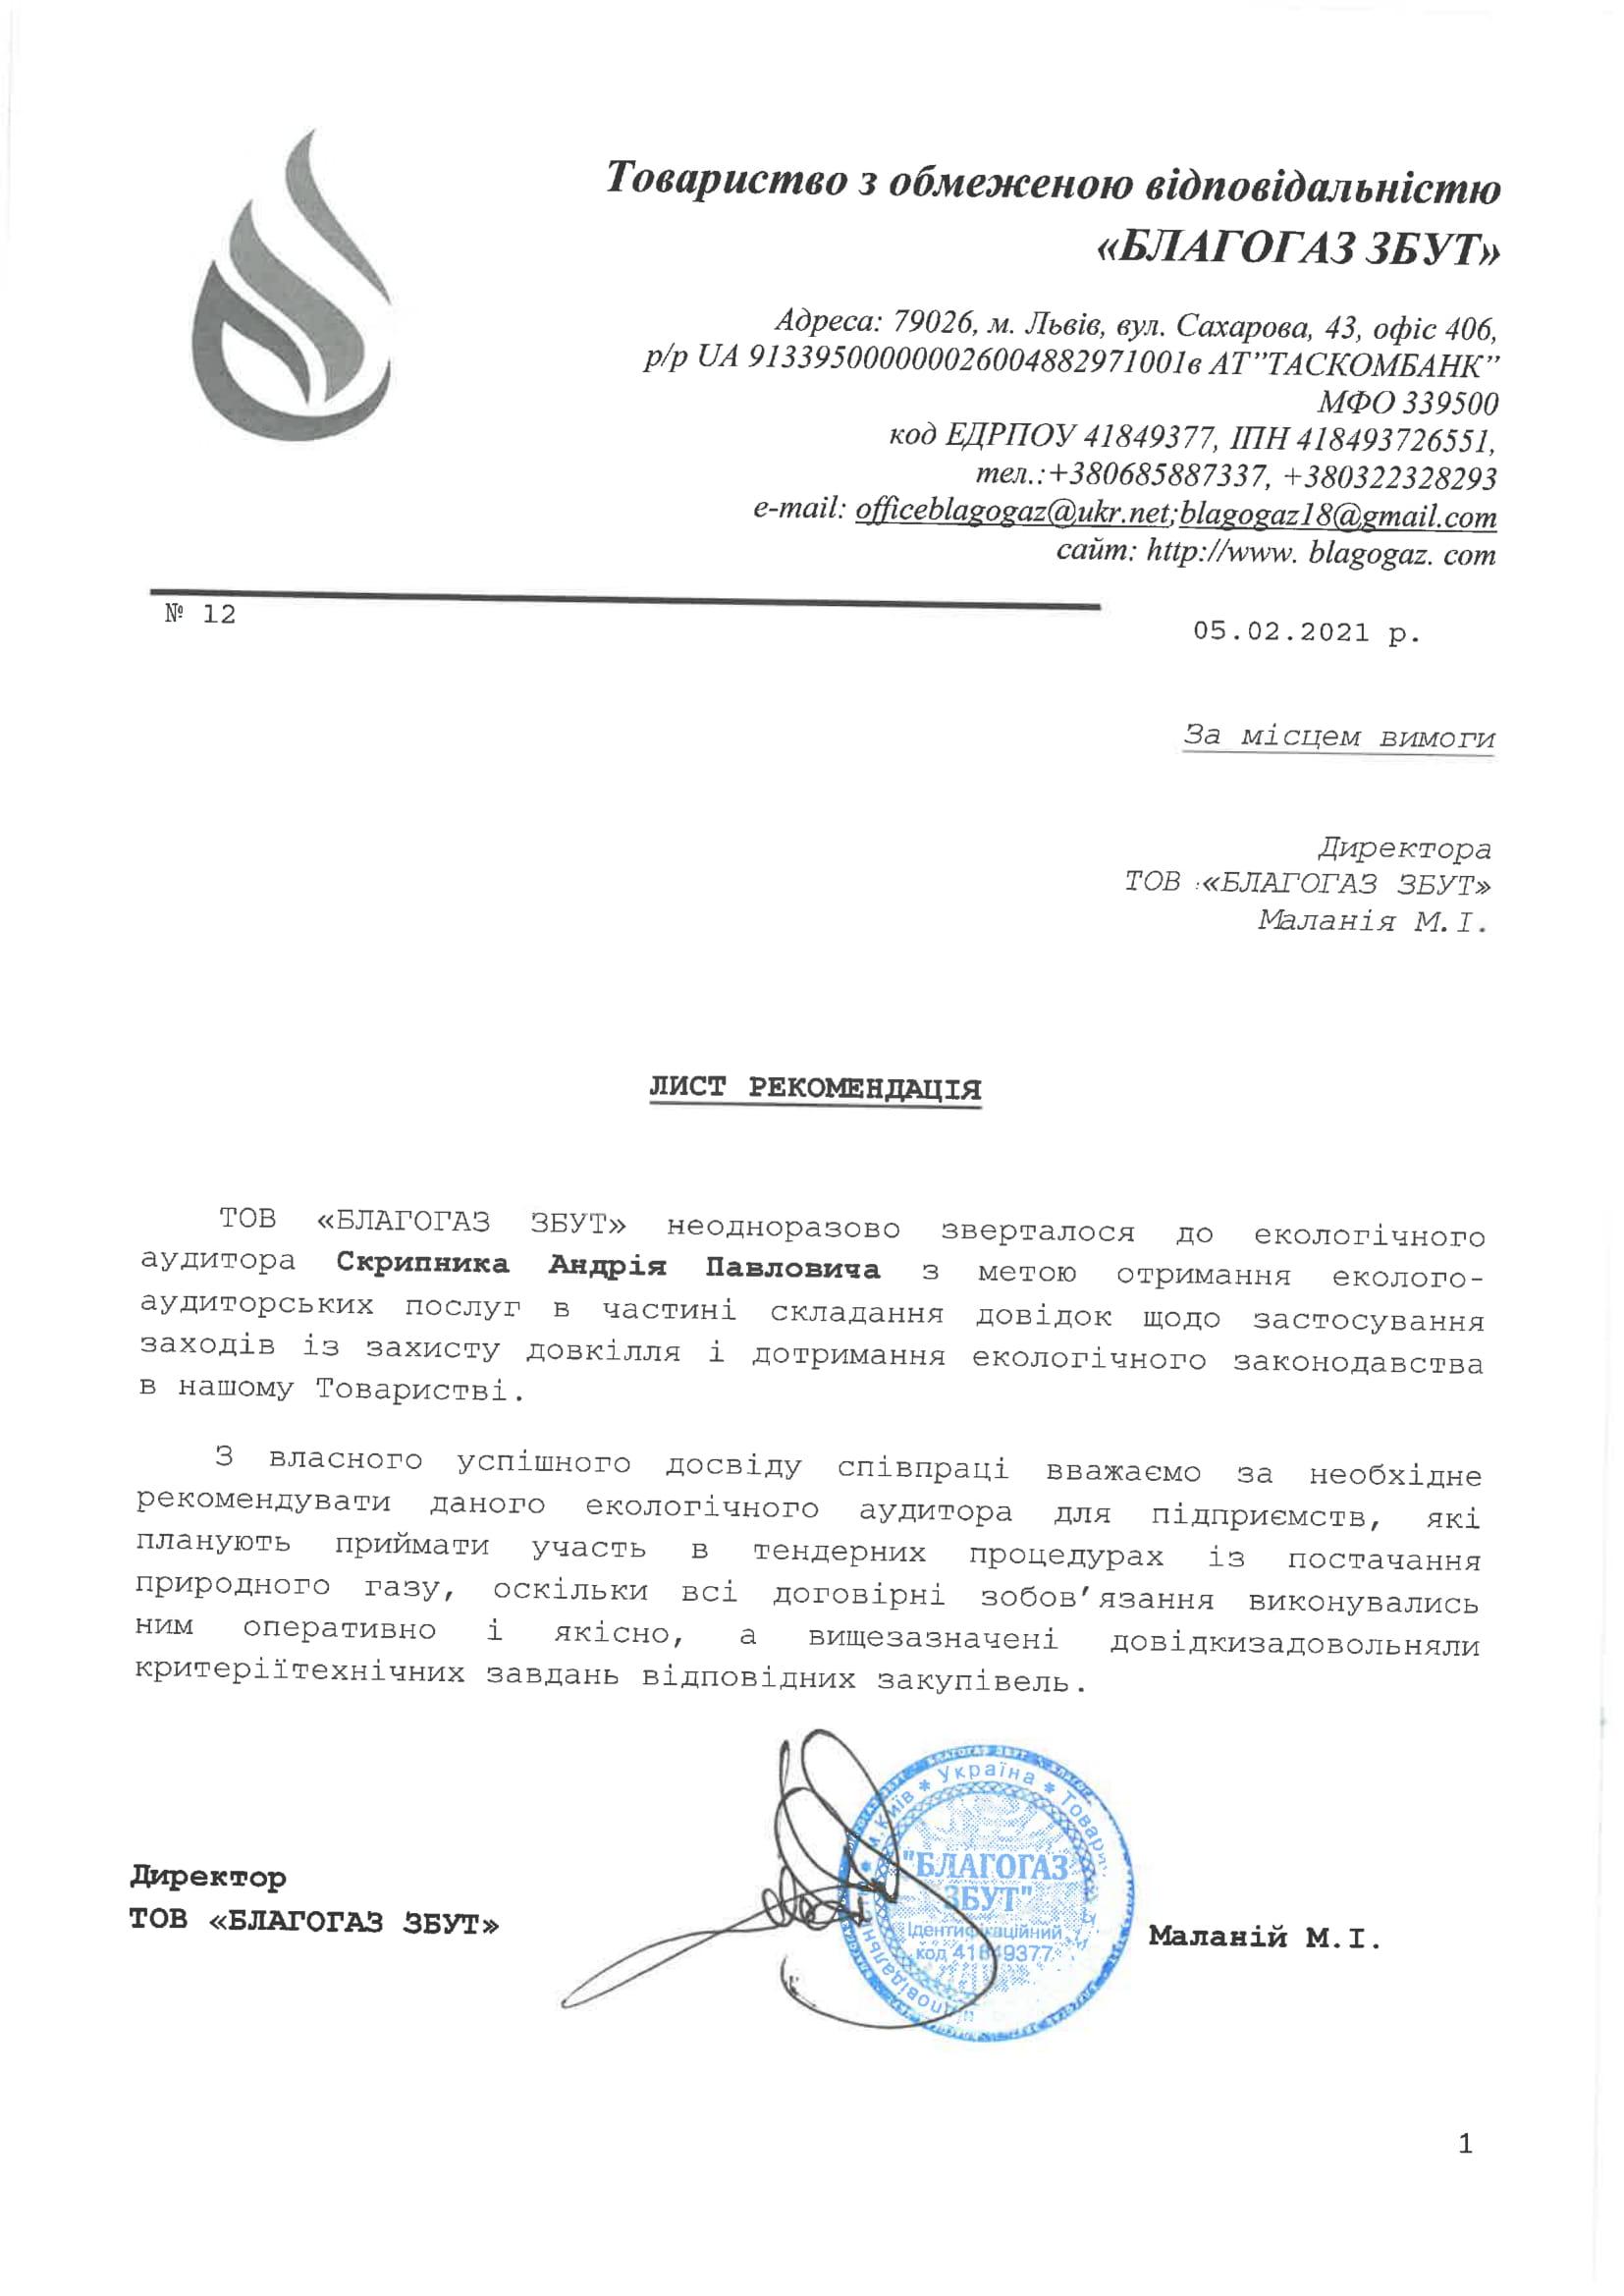 "Директор ООО ""Благогаз збыт"" – Маланий М.И."